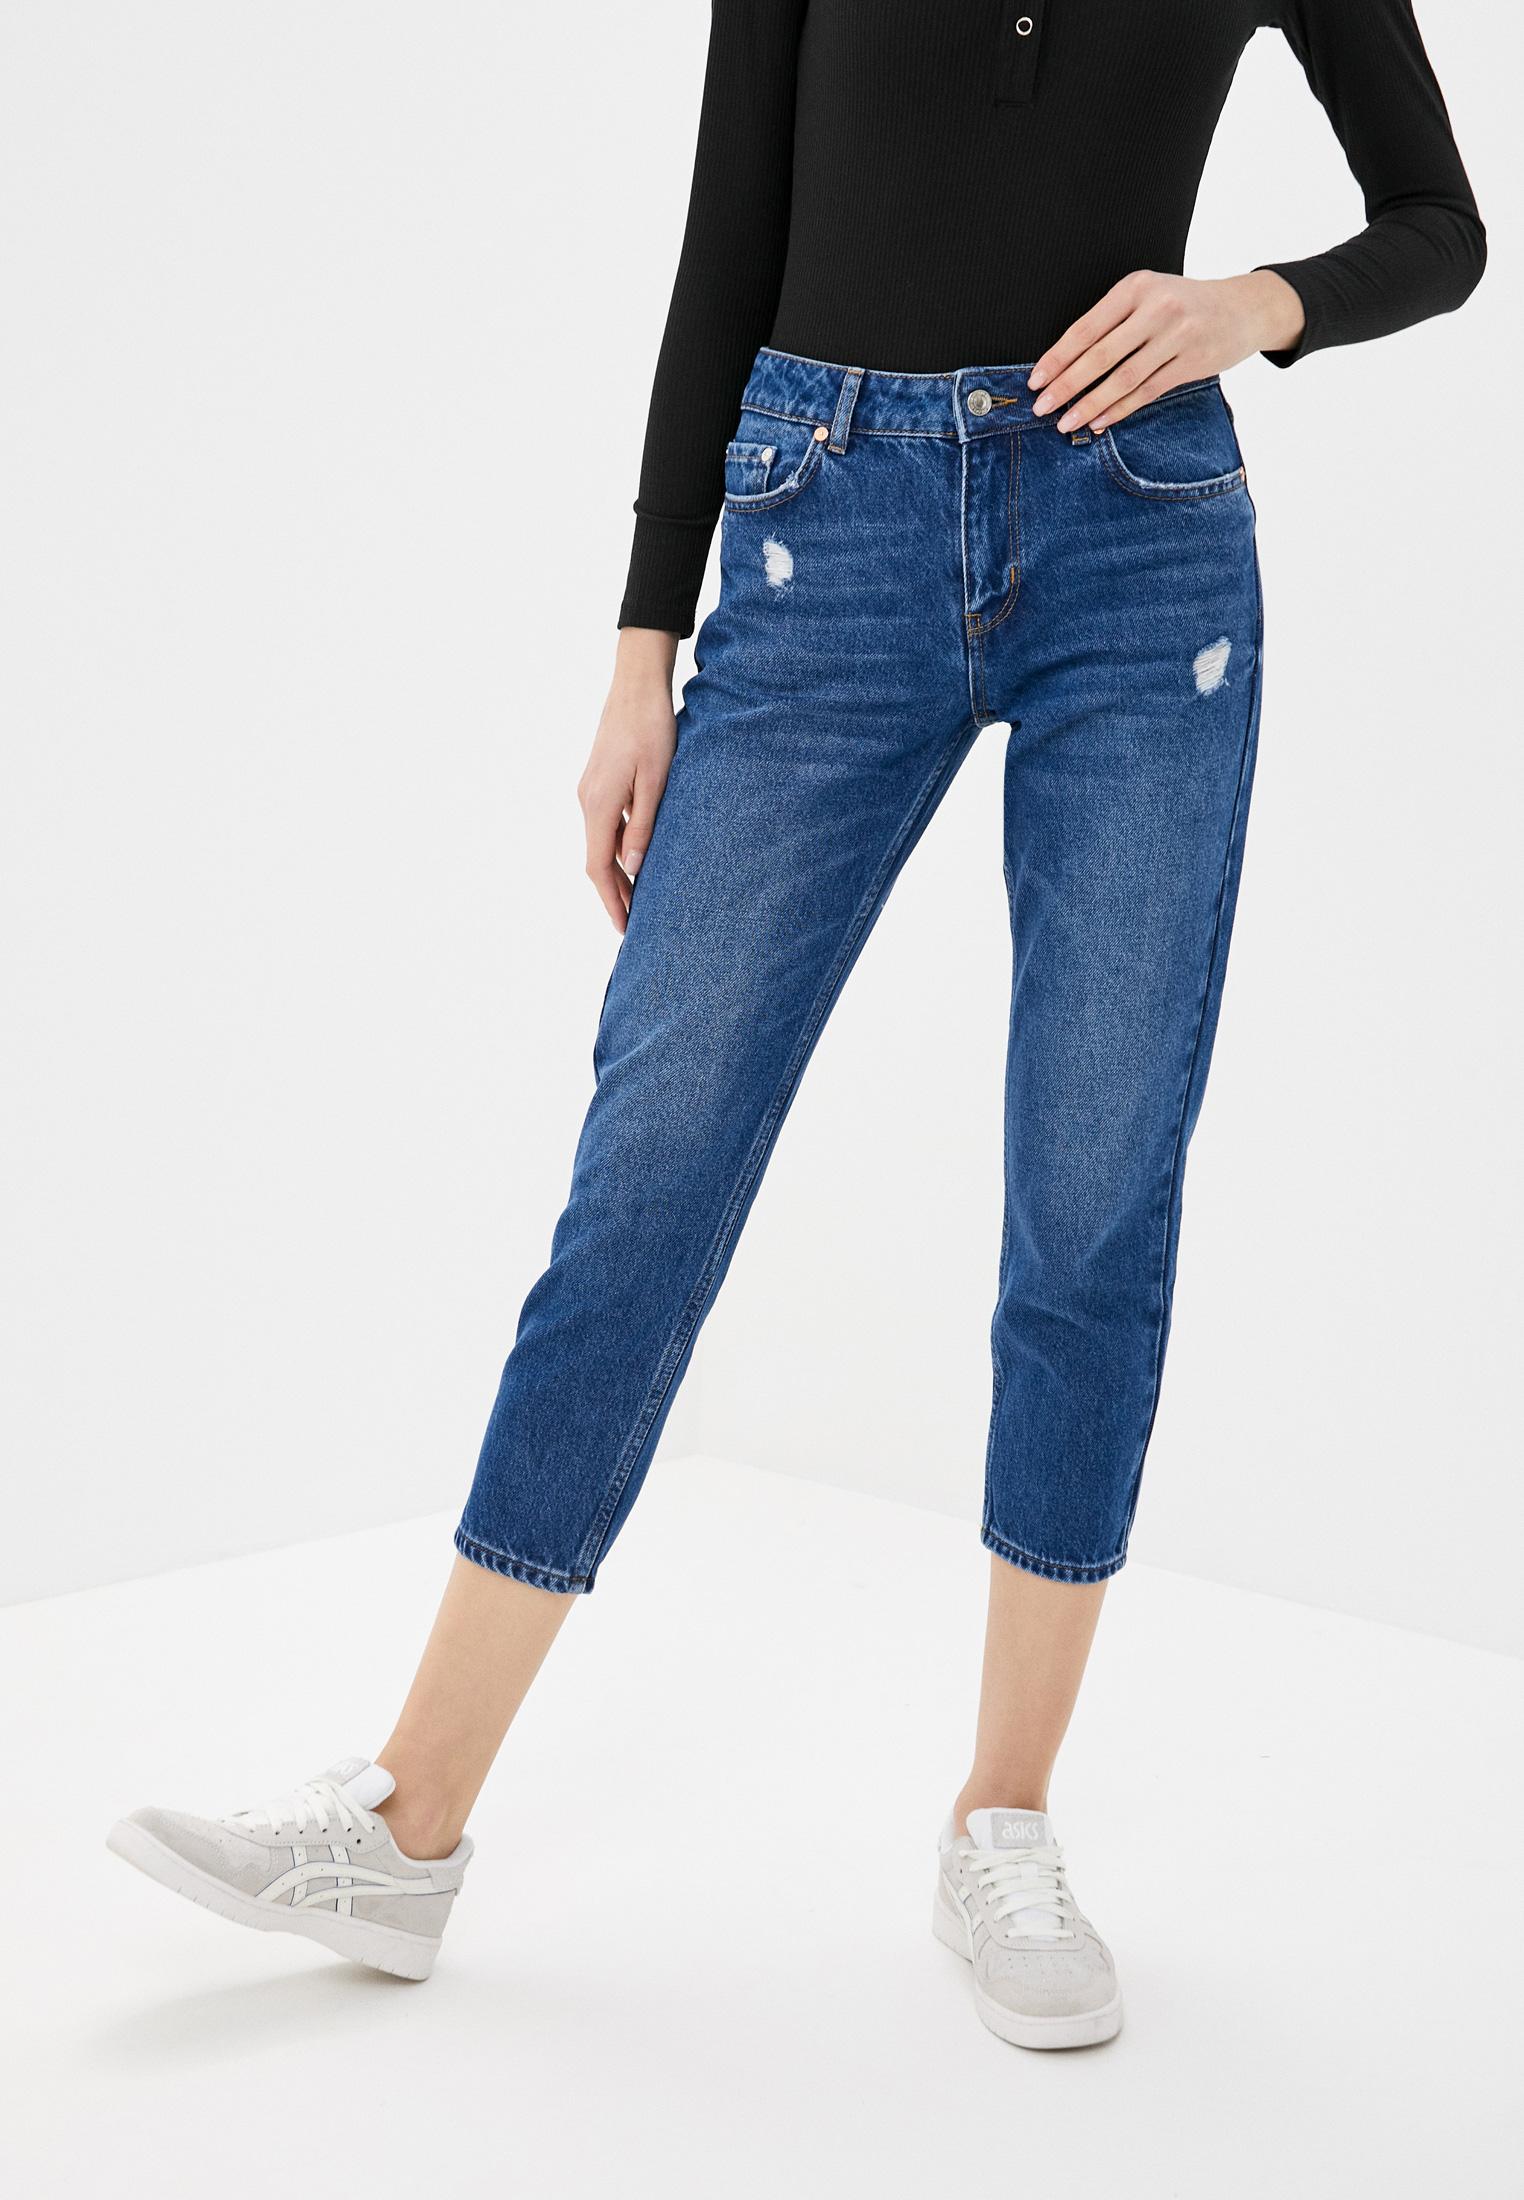 Зауженные джинсы United Colors of Benetton (Юнайтед Колорс оф Бенеттон) 4Q9157563